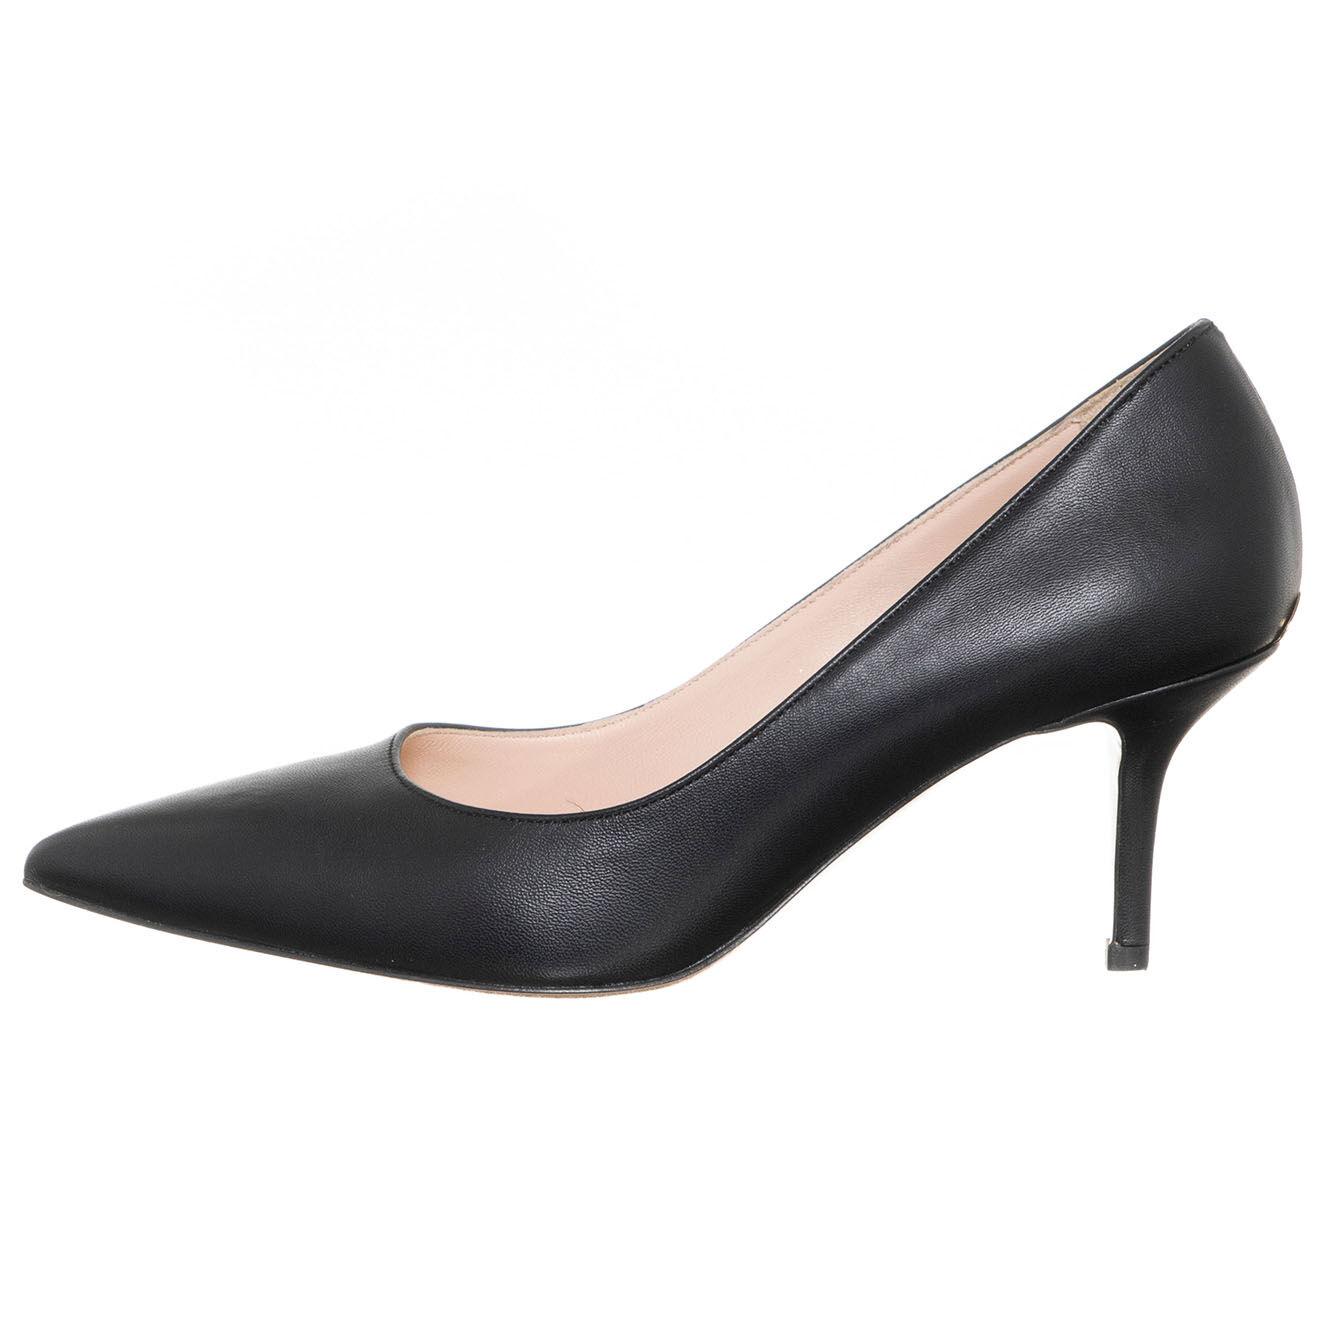 Escarpins en Cuir Audrey noirs - Talon 6 cm - Liu-Jo - Modalova